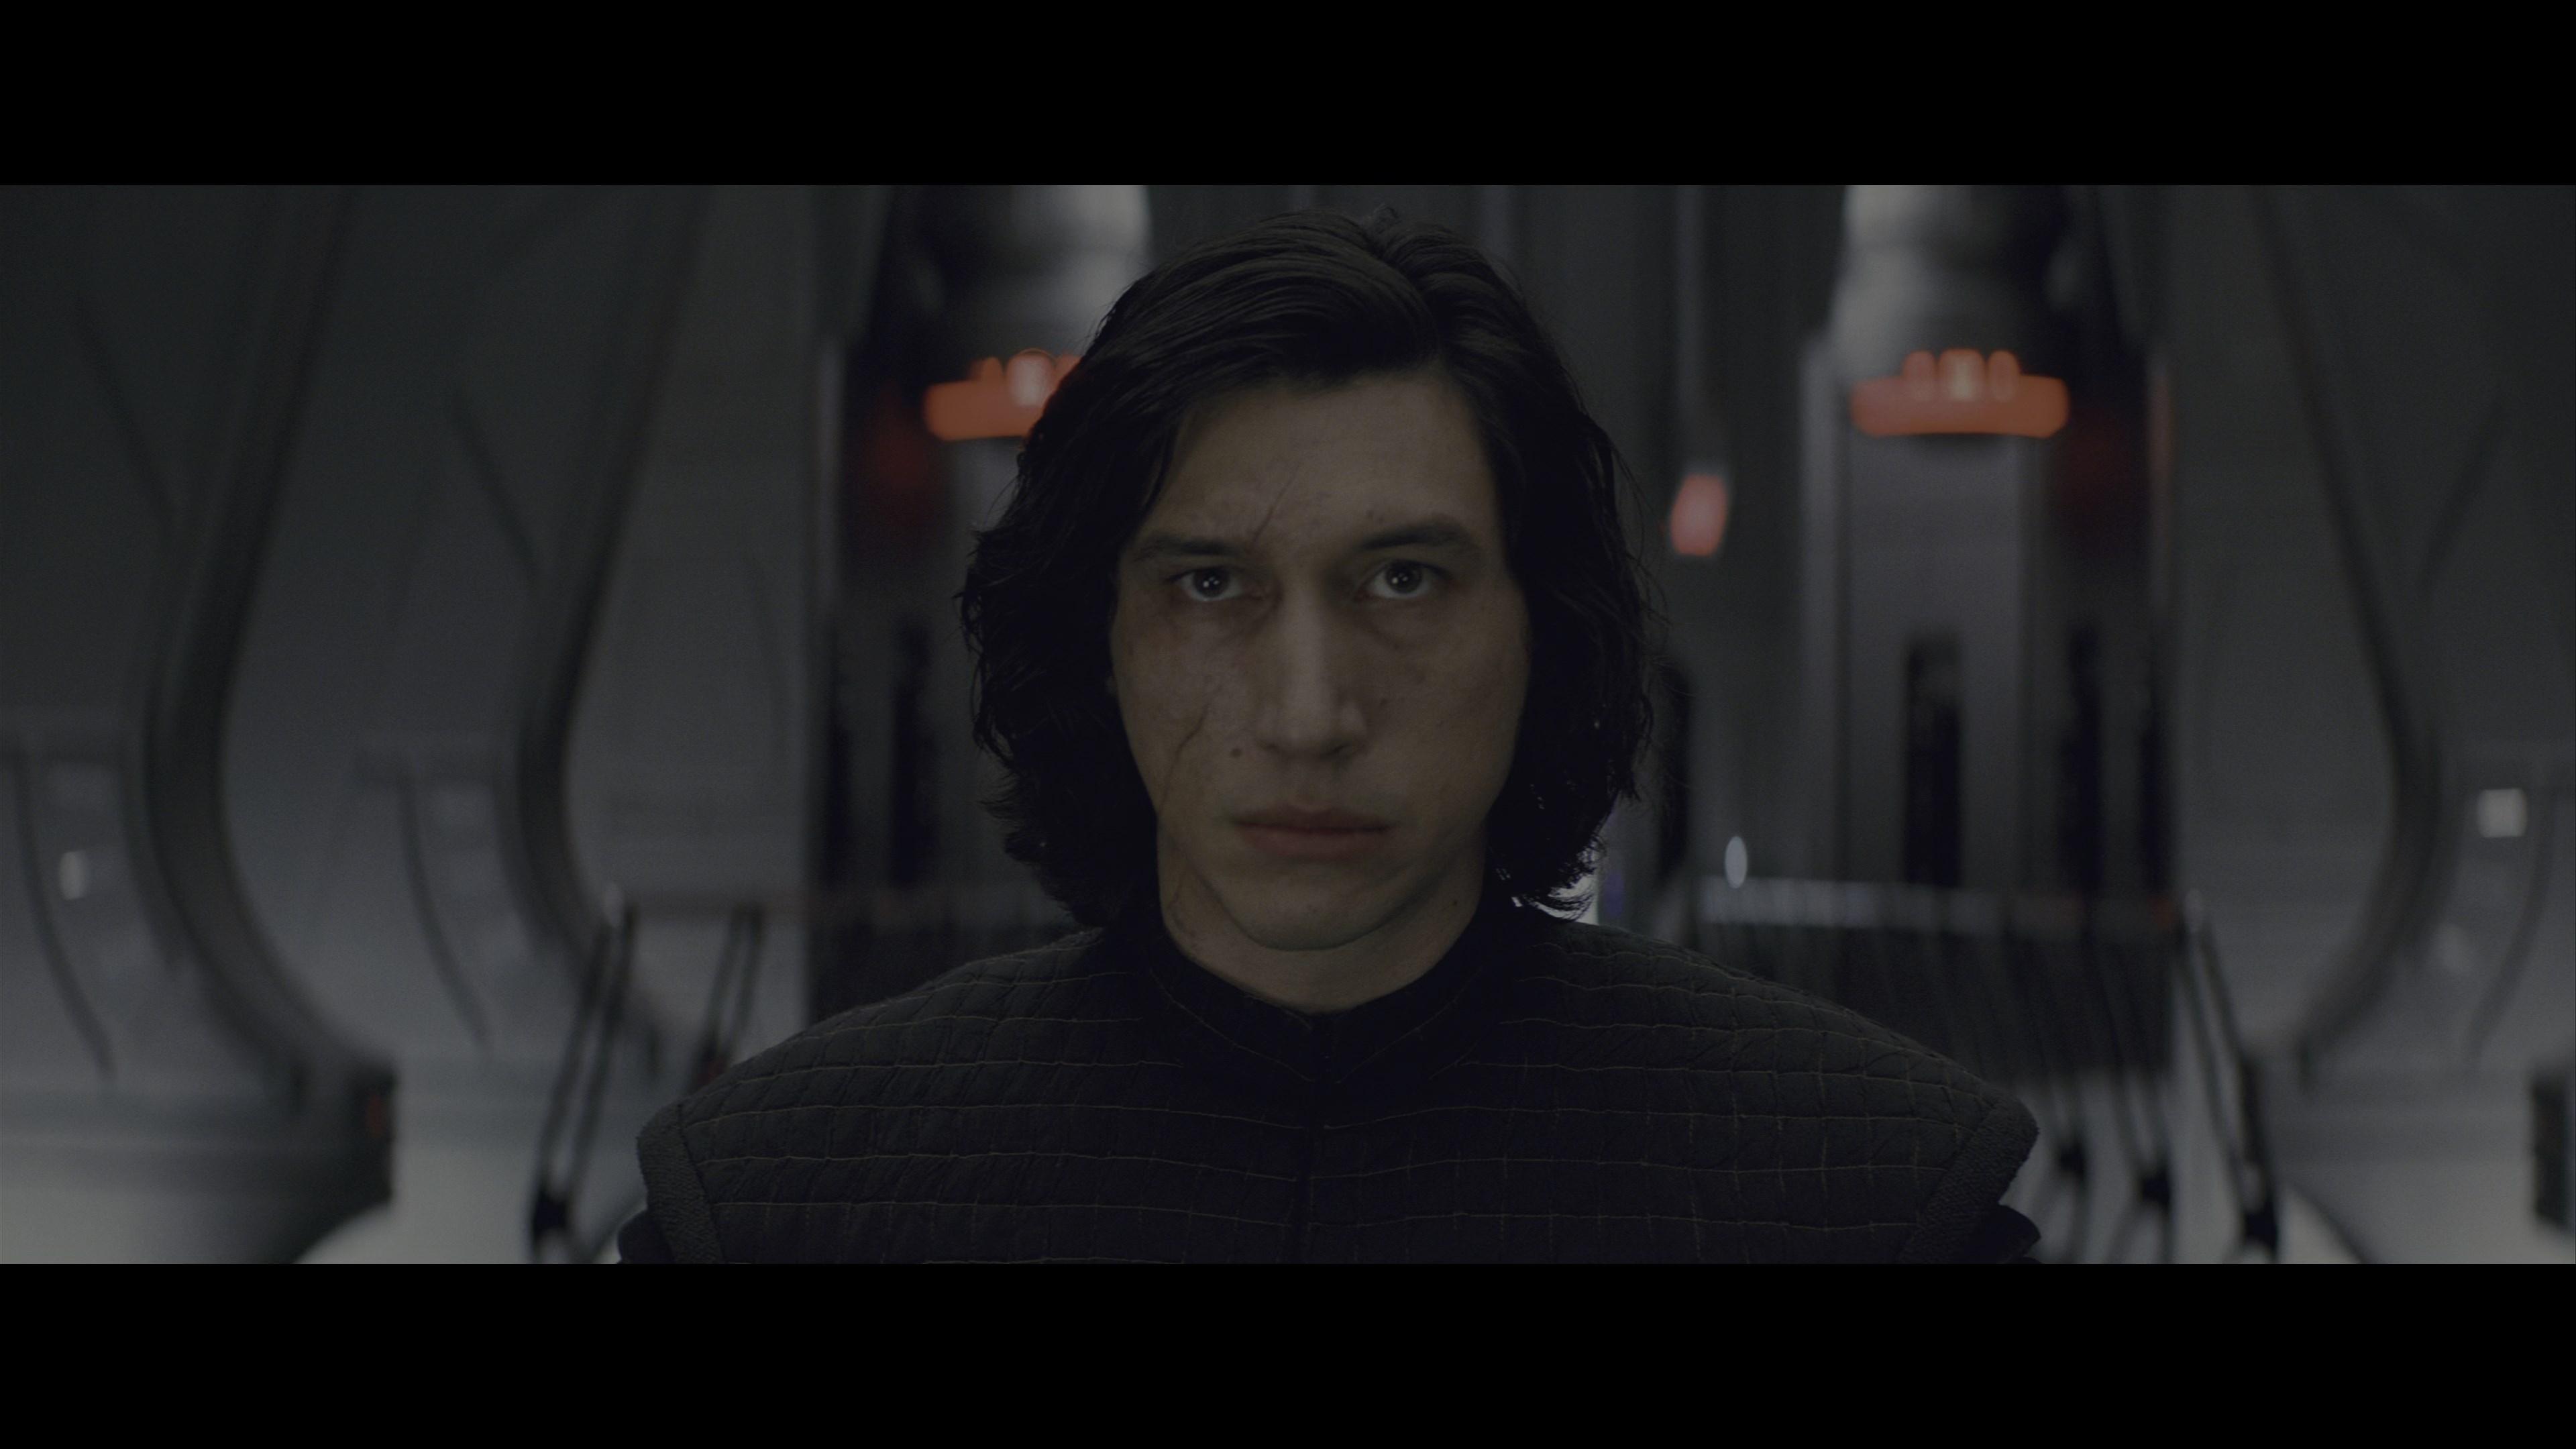 Star Wars: Son Jedi - Star Wars: Episode VIII - The Last Jedi - 2017 - 2160p - 4K UltraHD - HDR - BluRay - x265 - Türkçe Dublaj - DuaL - TR - EN - Tek Link